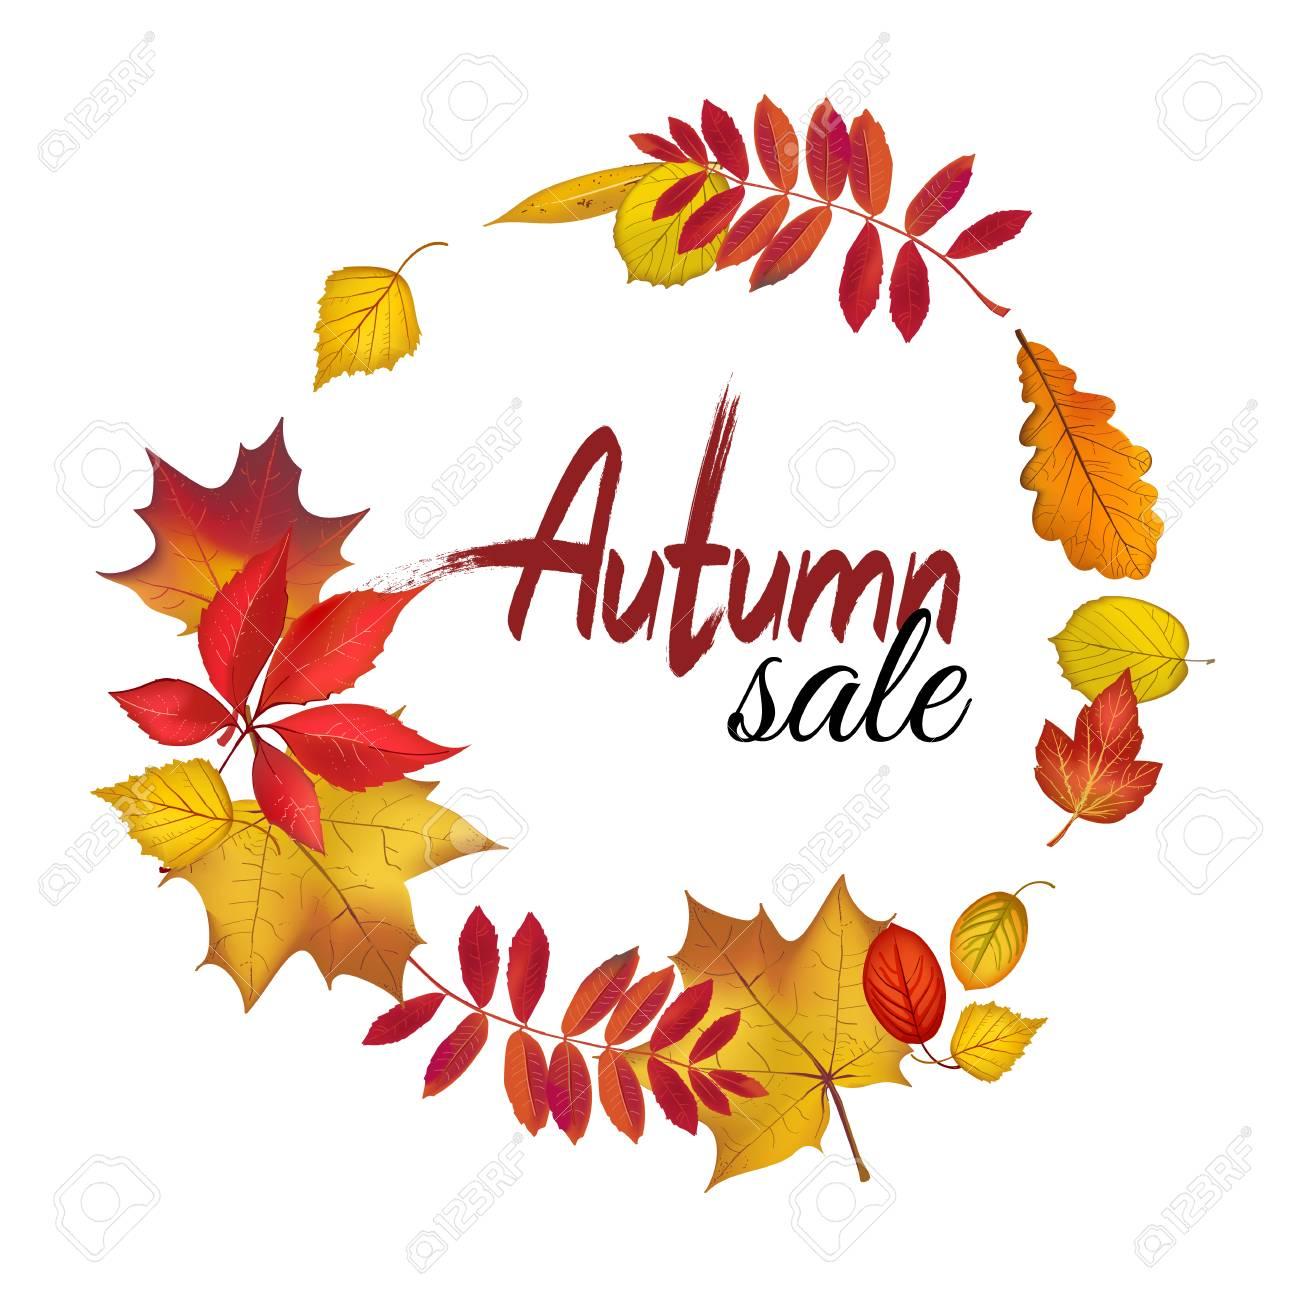 fall leaves wreath for autumn sale design autumn lettering